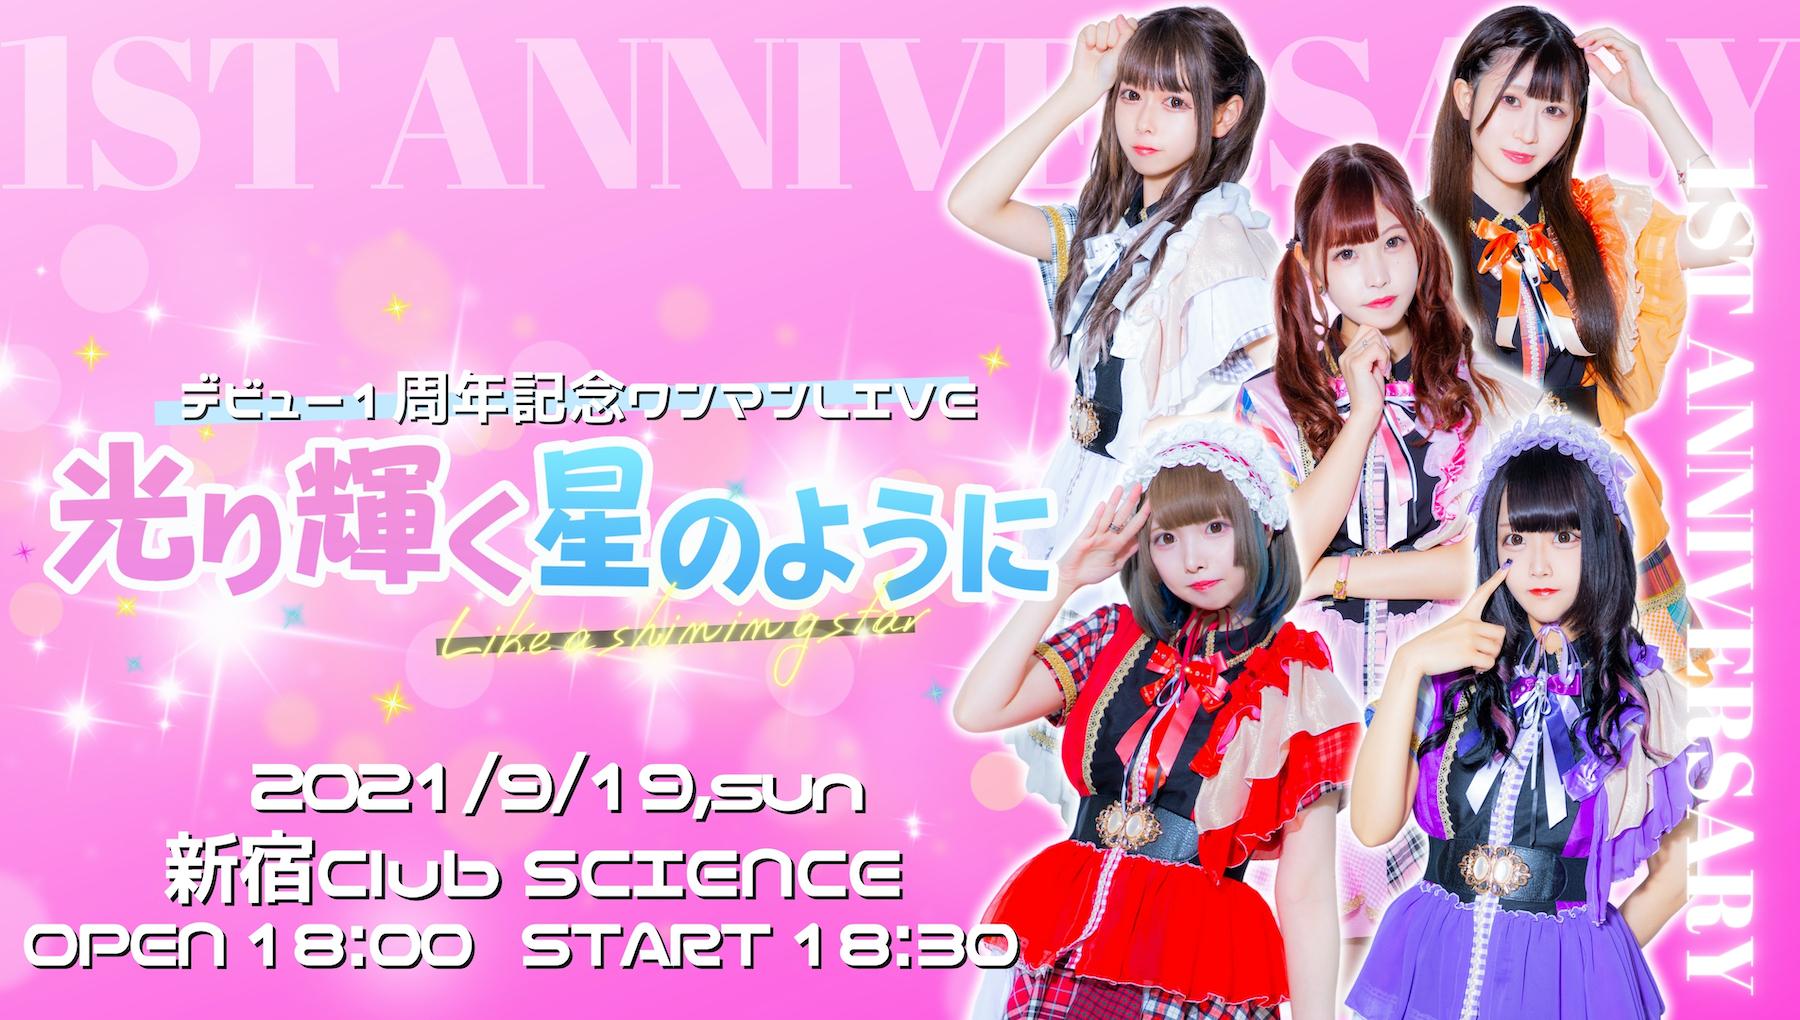 【Starly☆1周年記念ワンマンLIVE-光り輝く星のように-】新衣装お披露目!